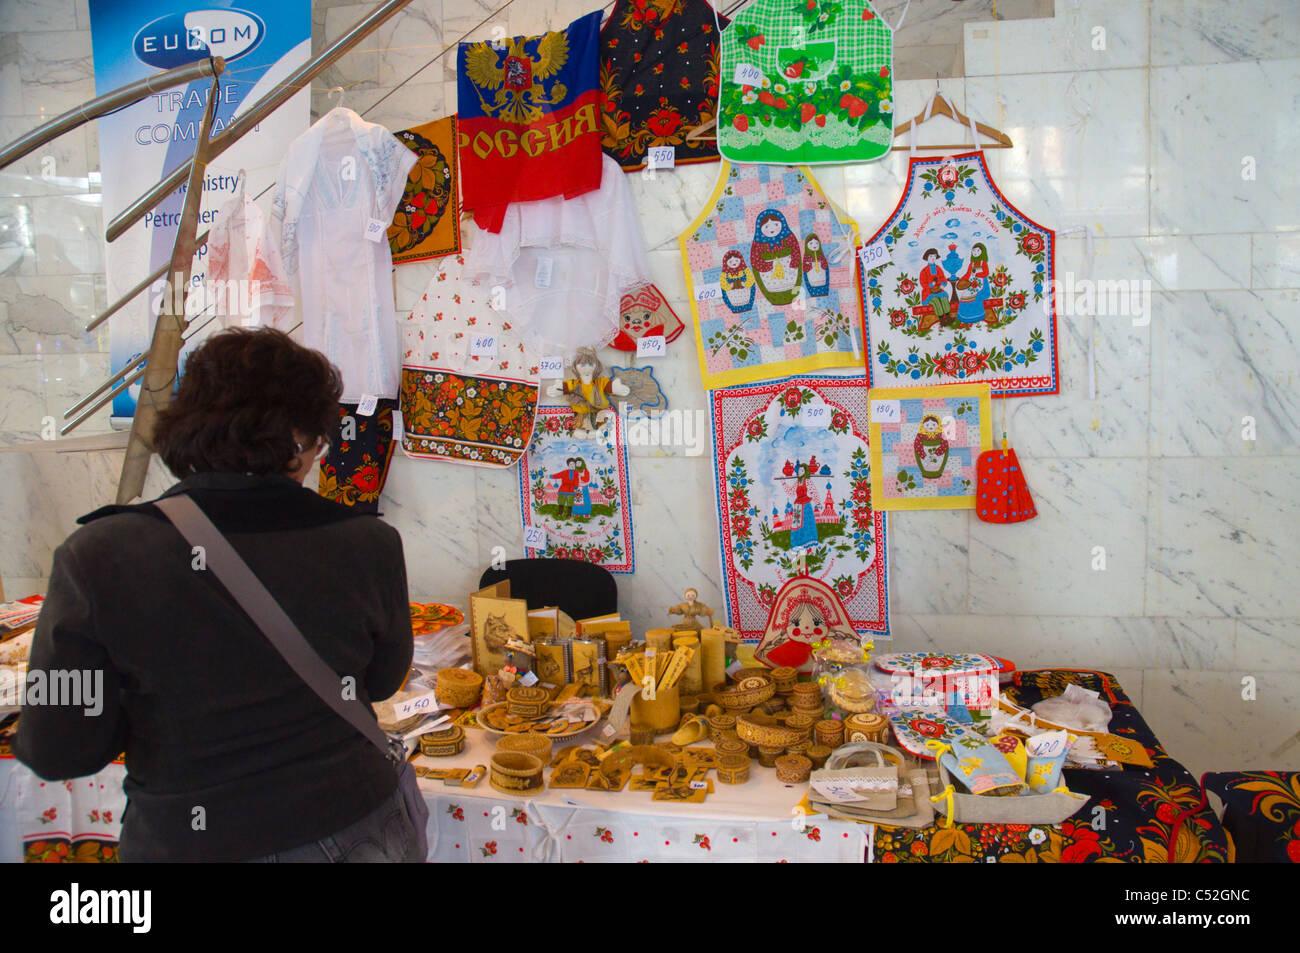 Russian handicrafts for sale Russian Serbian festival market along Knez Mihailova main street Belgrade capital of - Stock Image